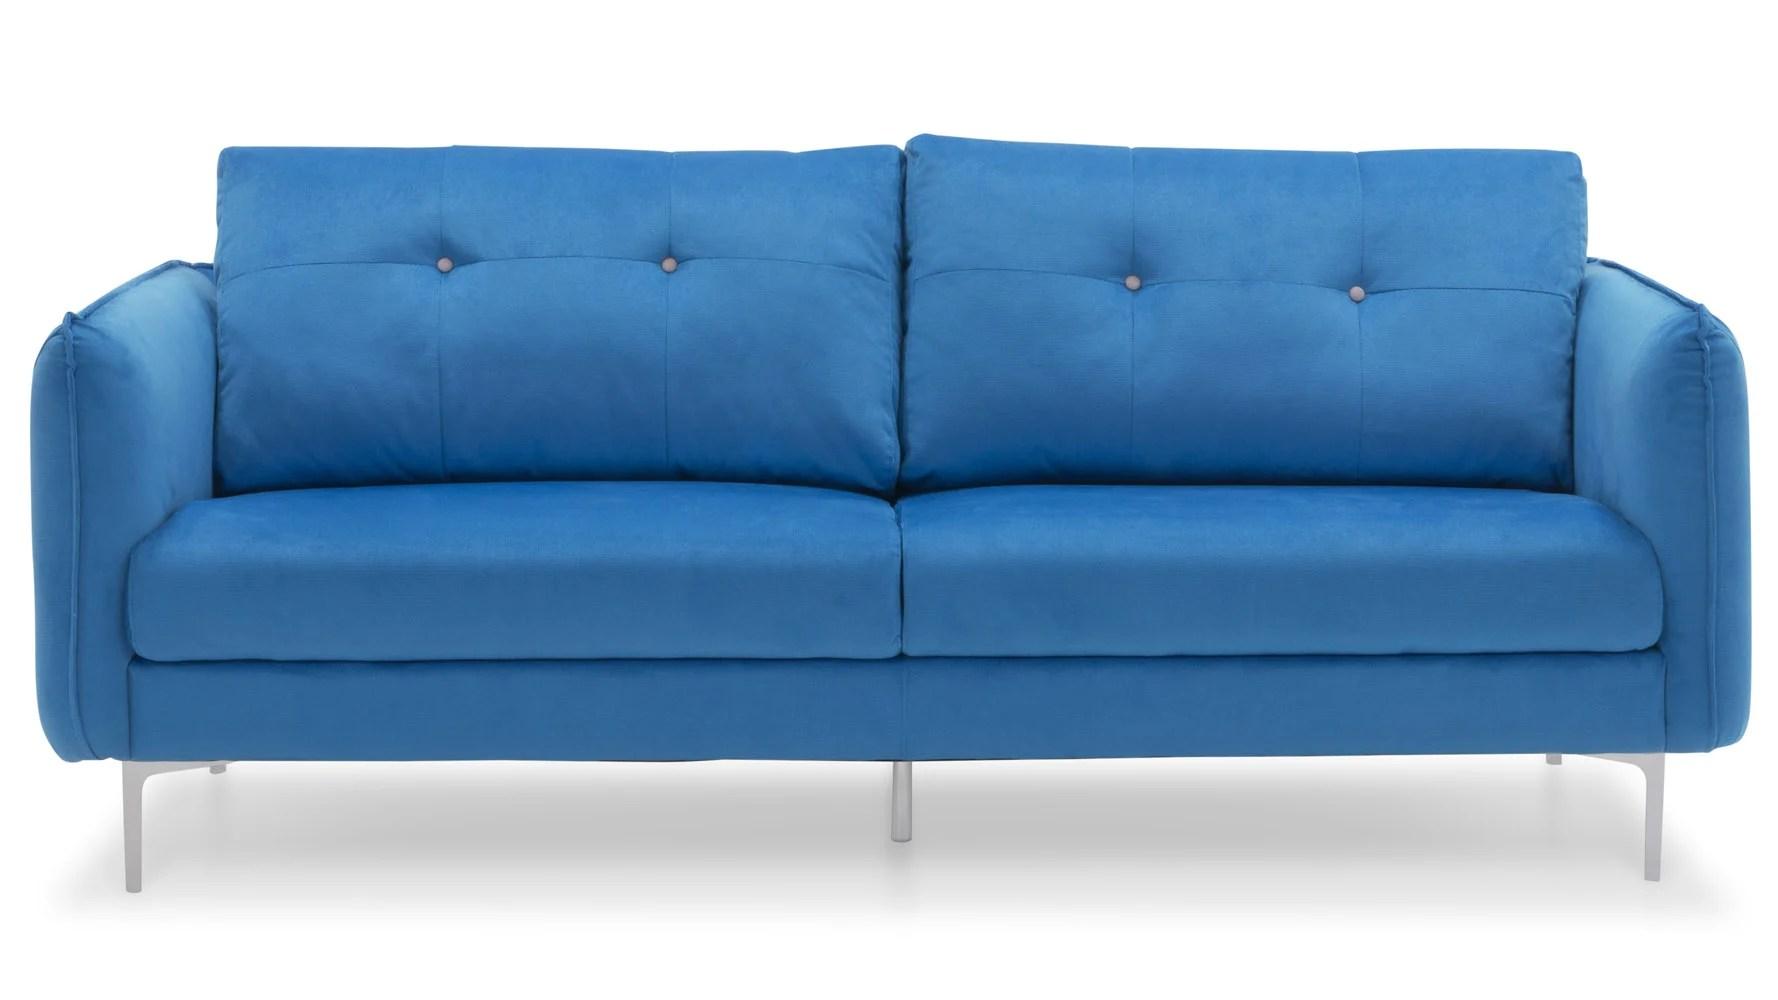 light brown tweed sofa good quality corner bed blue model 711 danish beige mid century